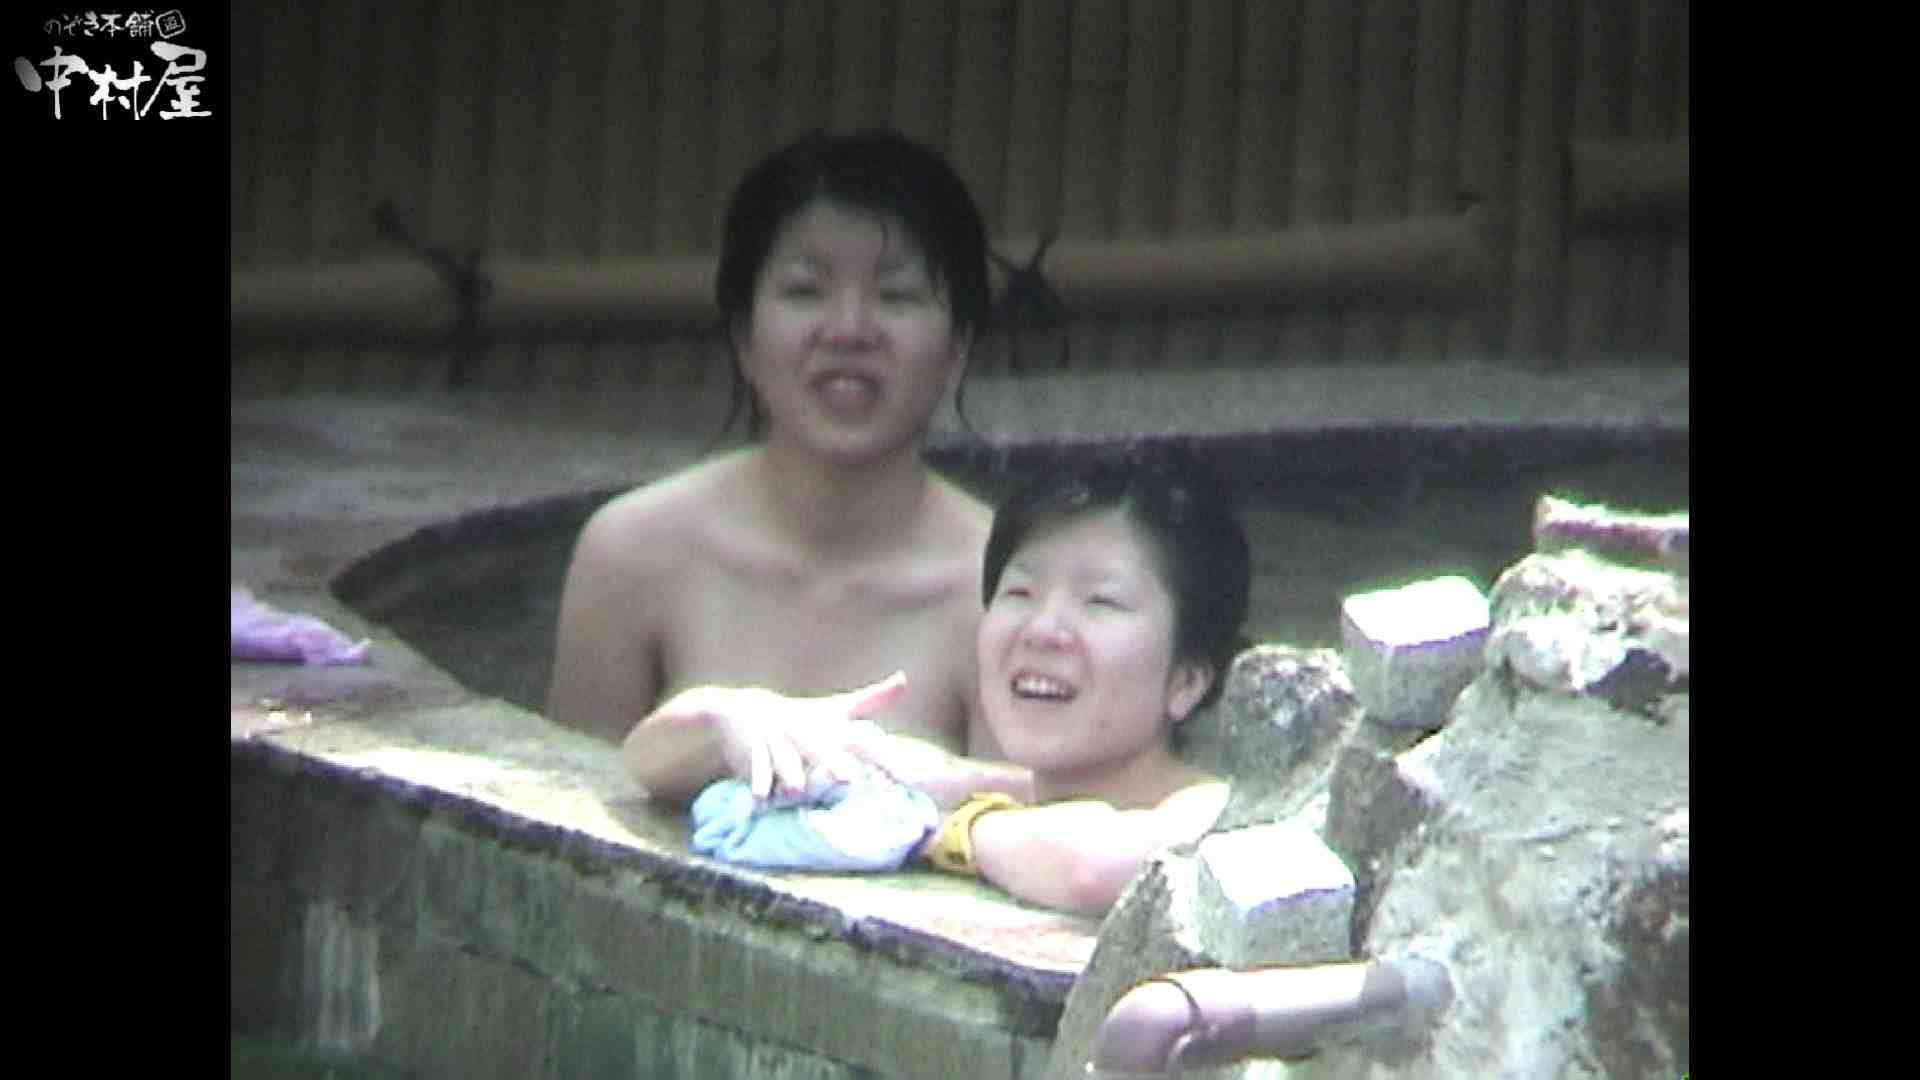 Aquaな露天風呂Vol.936 盗撮映像  110Pix 1